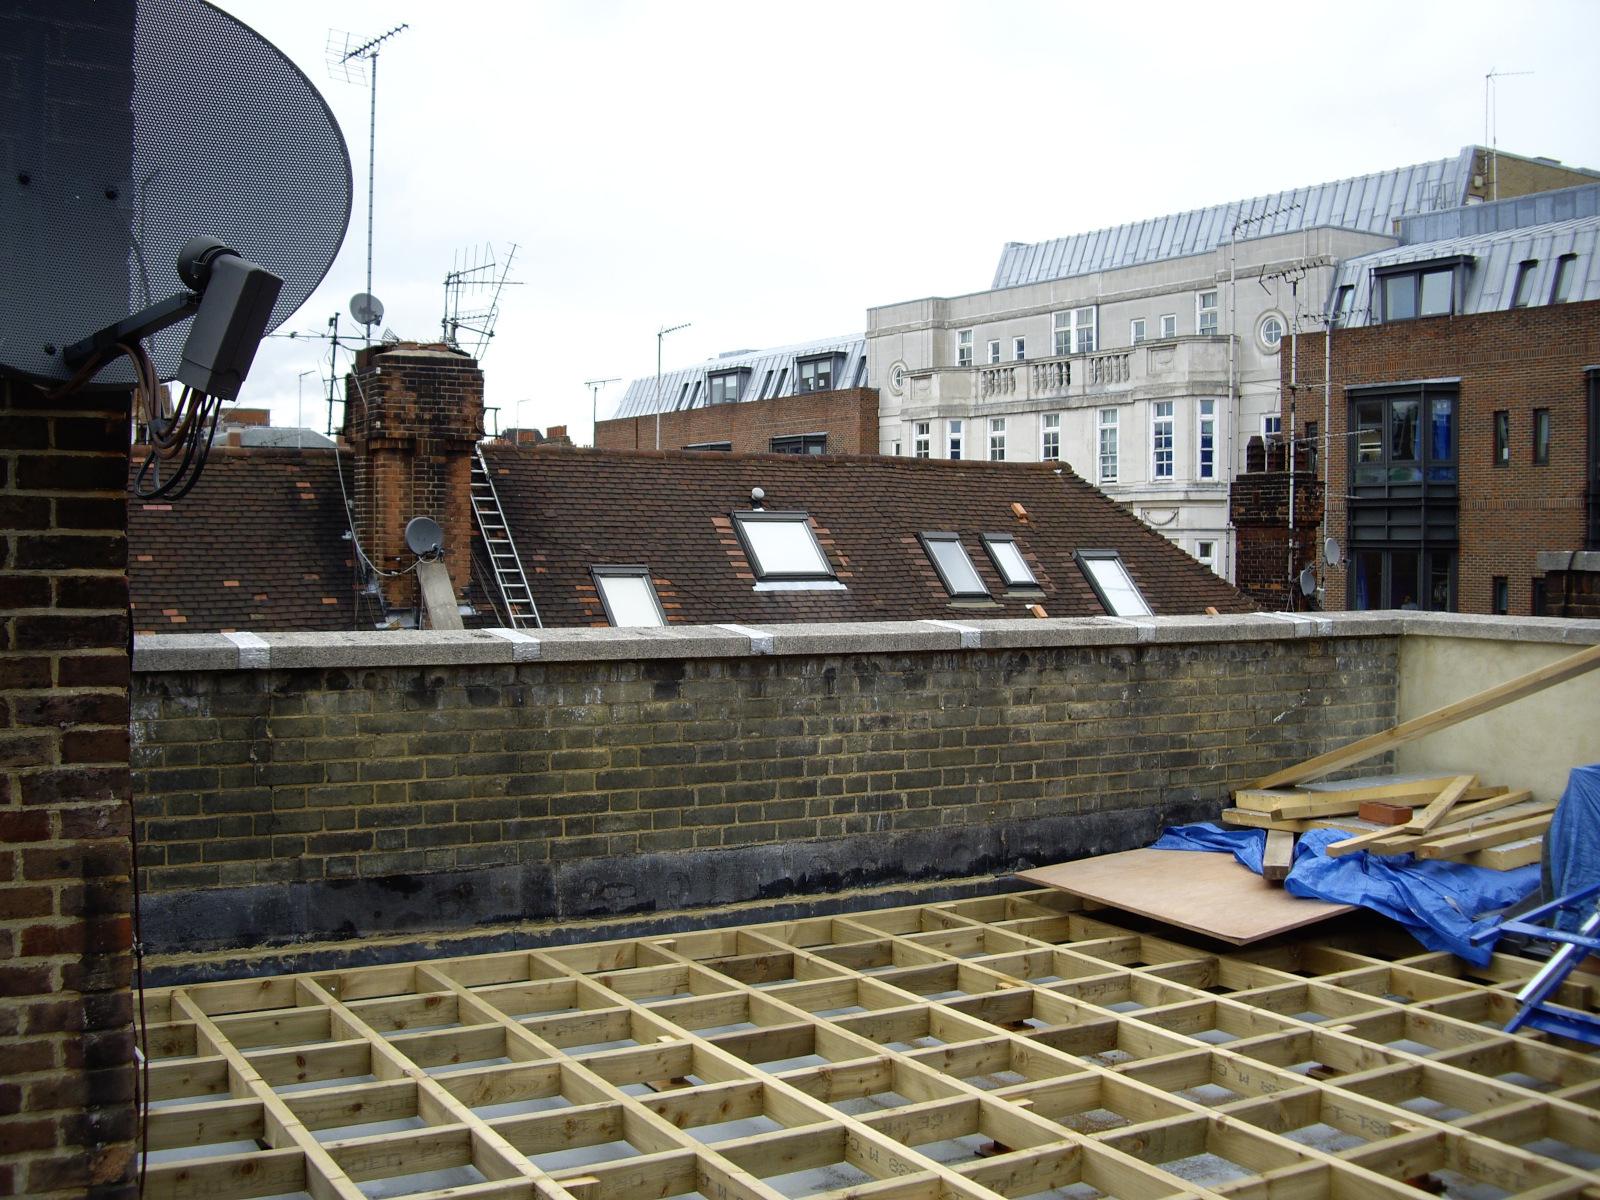 The Challenges of exposed Garden Design for rooftop gardens